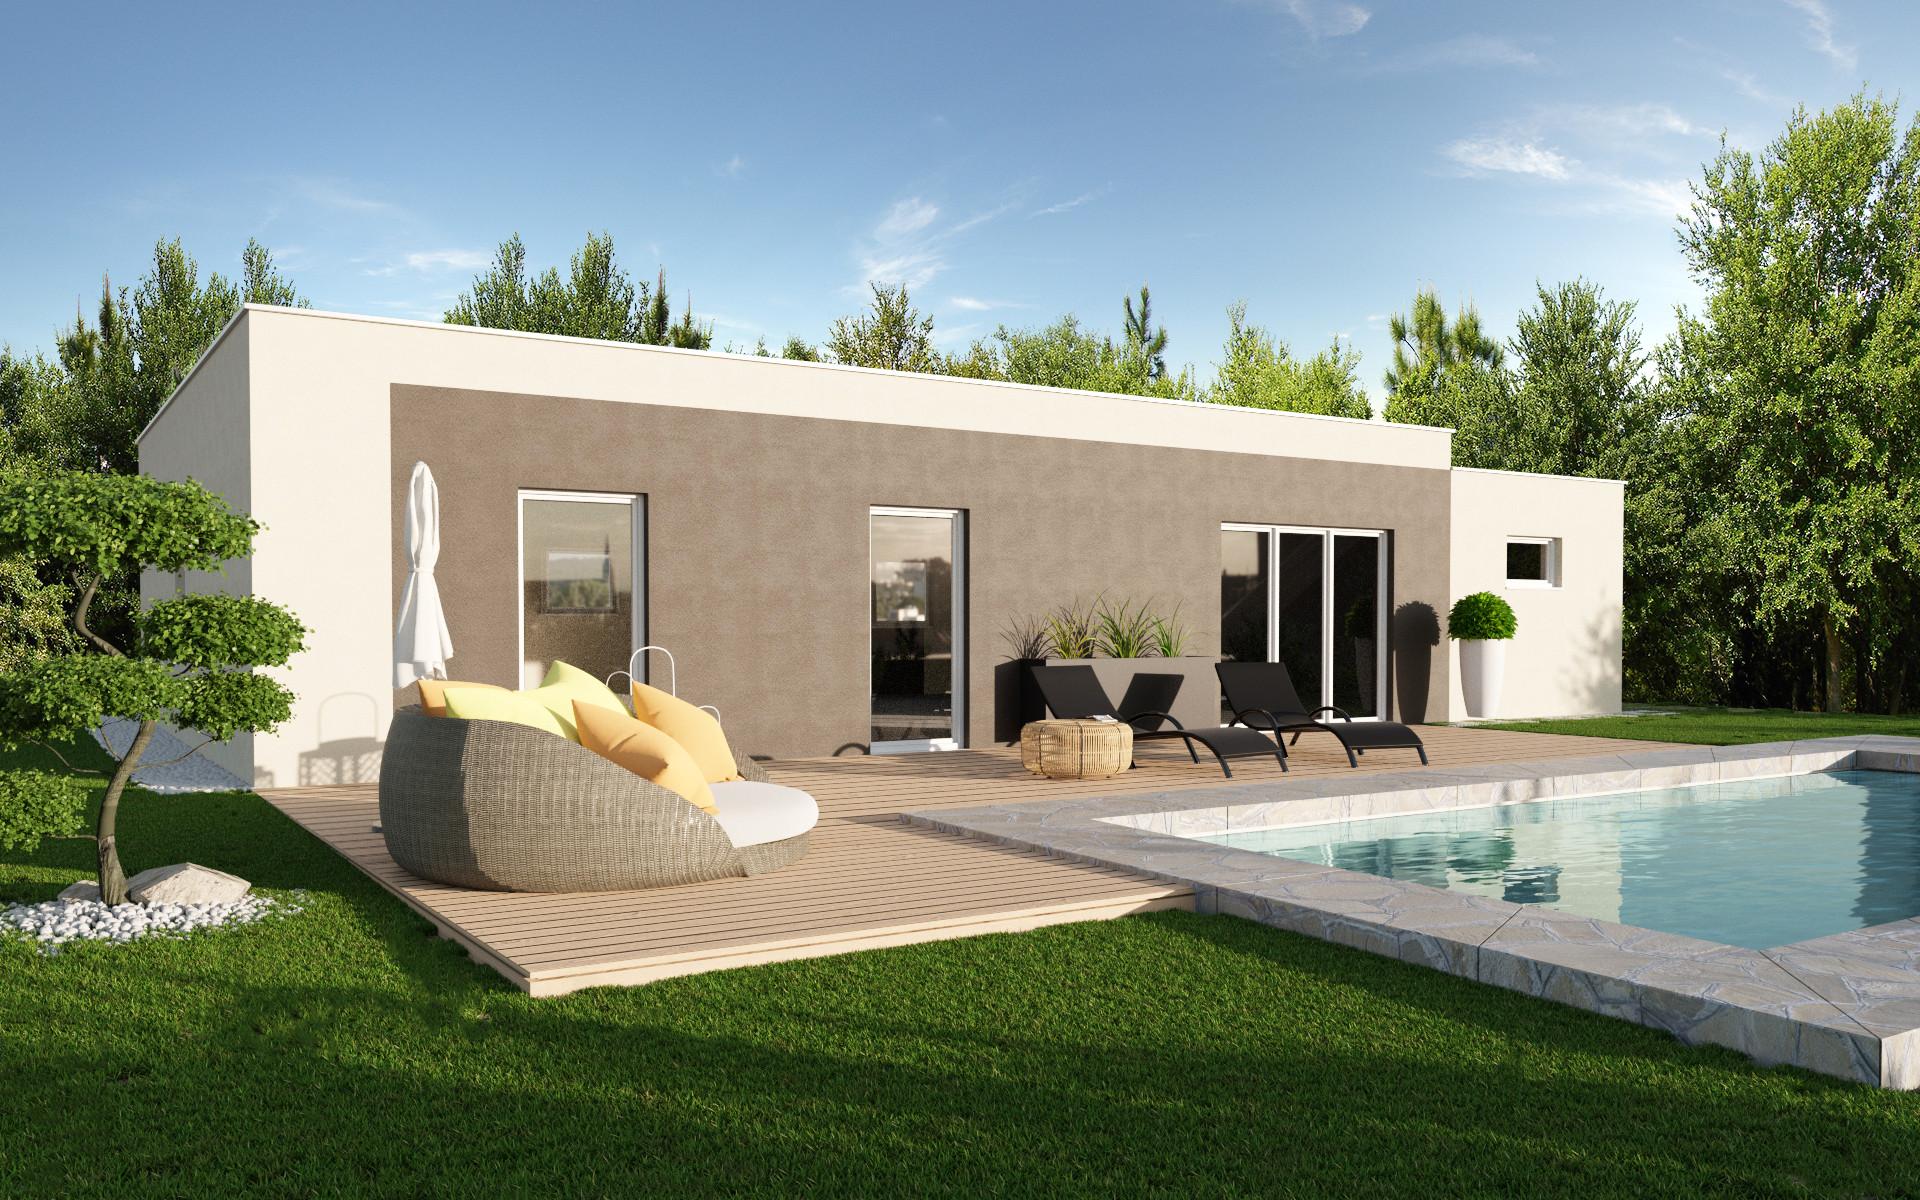 maison plain pied design. Black Bedroom Furniture Sets. Home Design Ideas